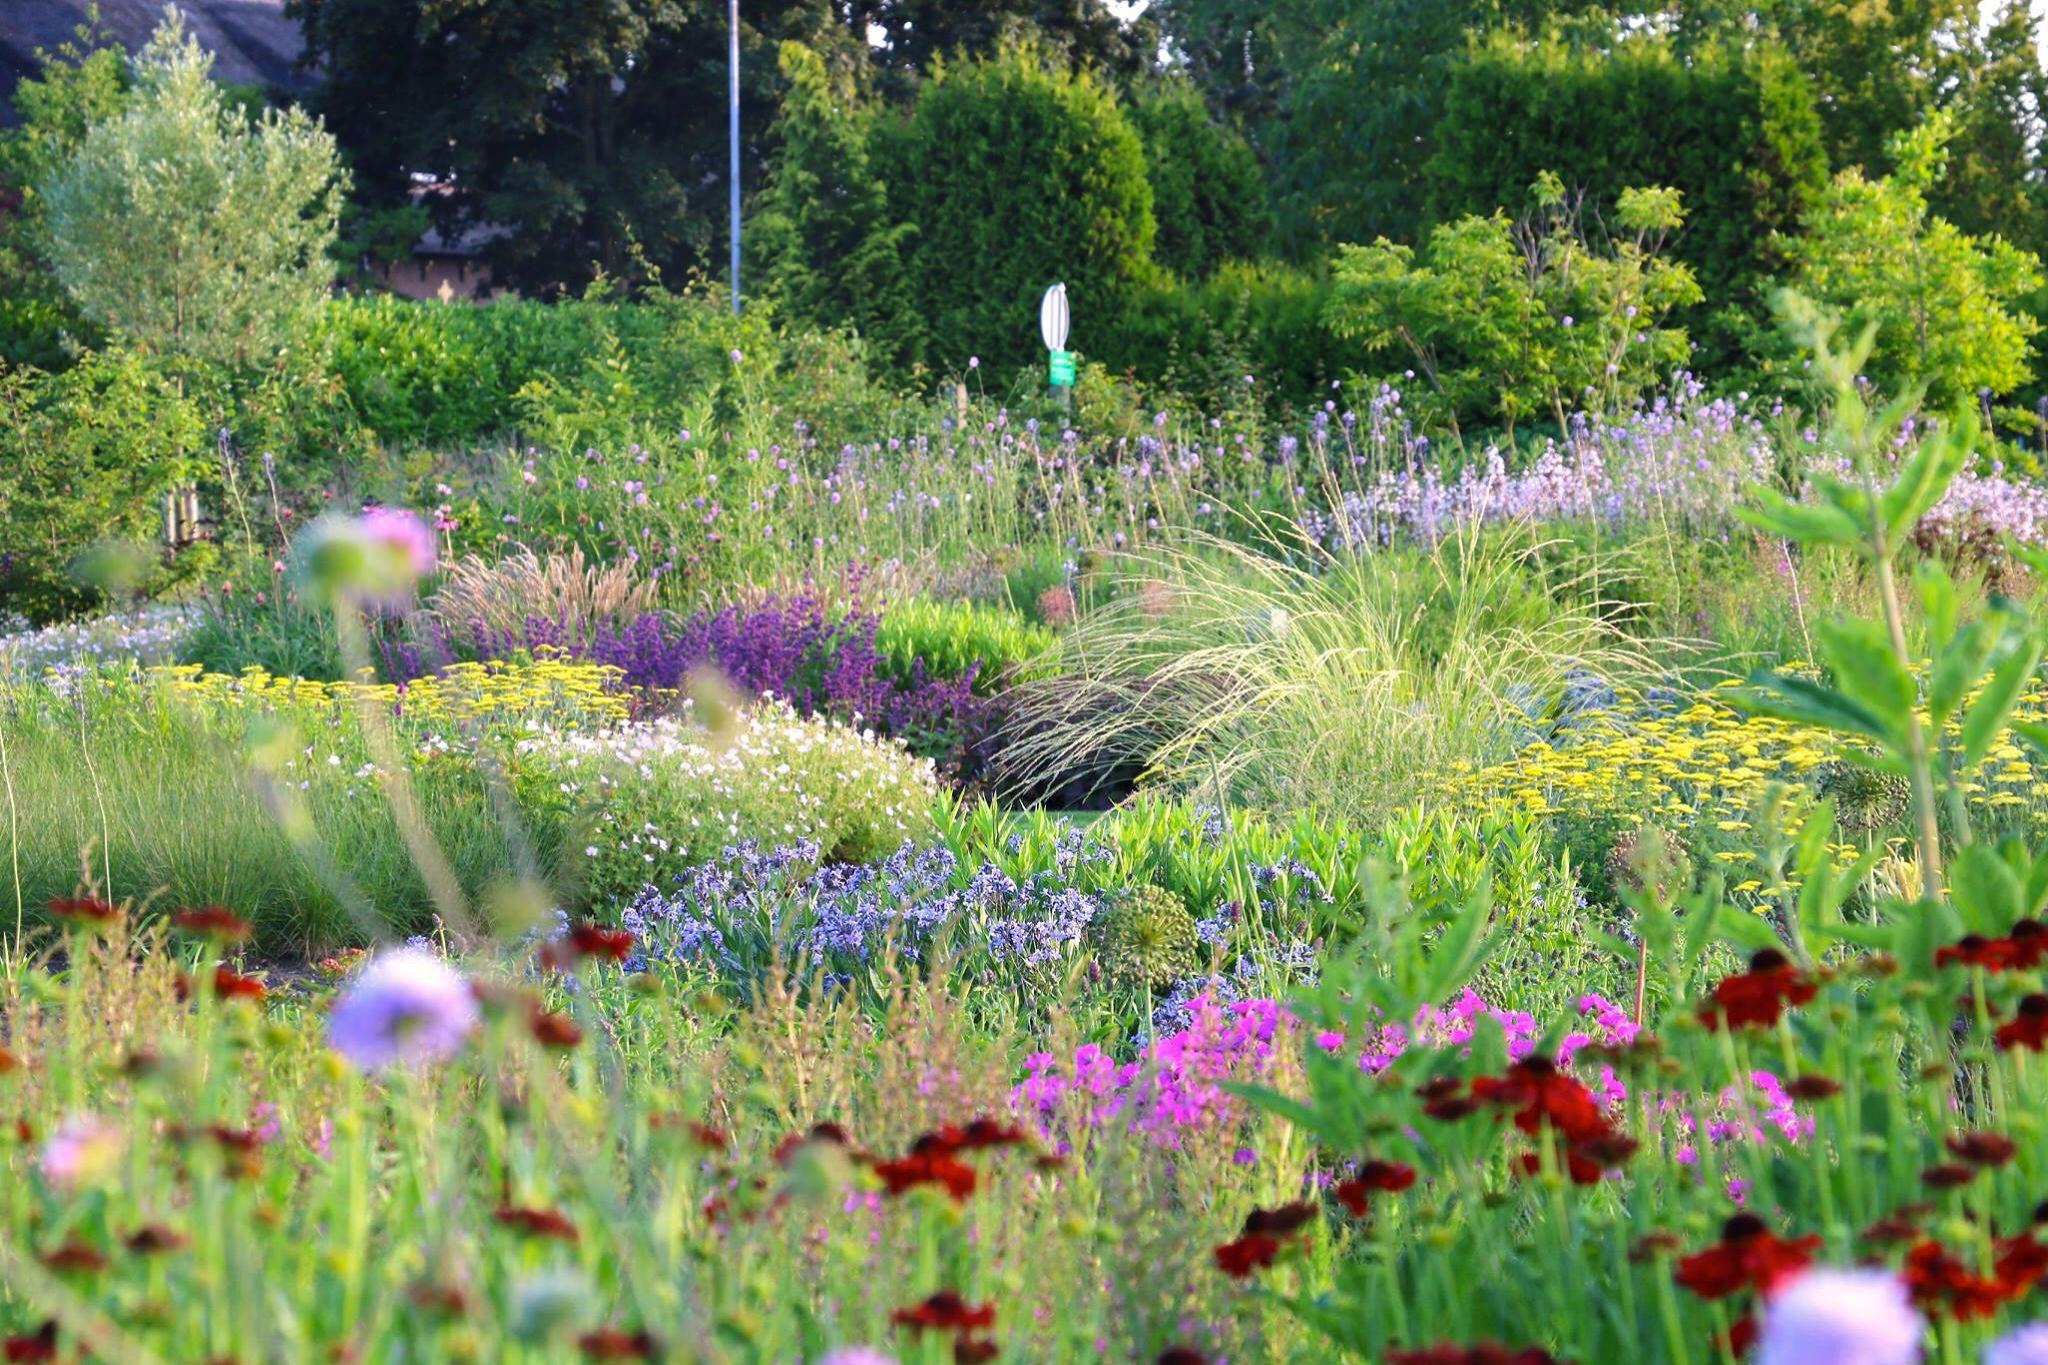 2015 vlinderhof maximapark utrecht piet oudolf for Piet oudolf pflanzplan